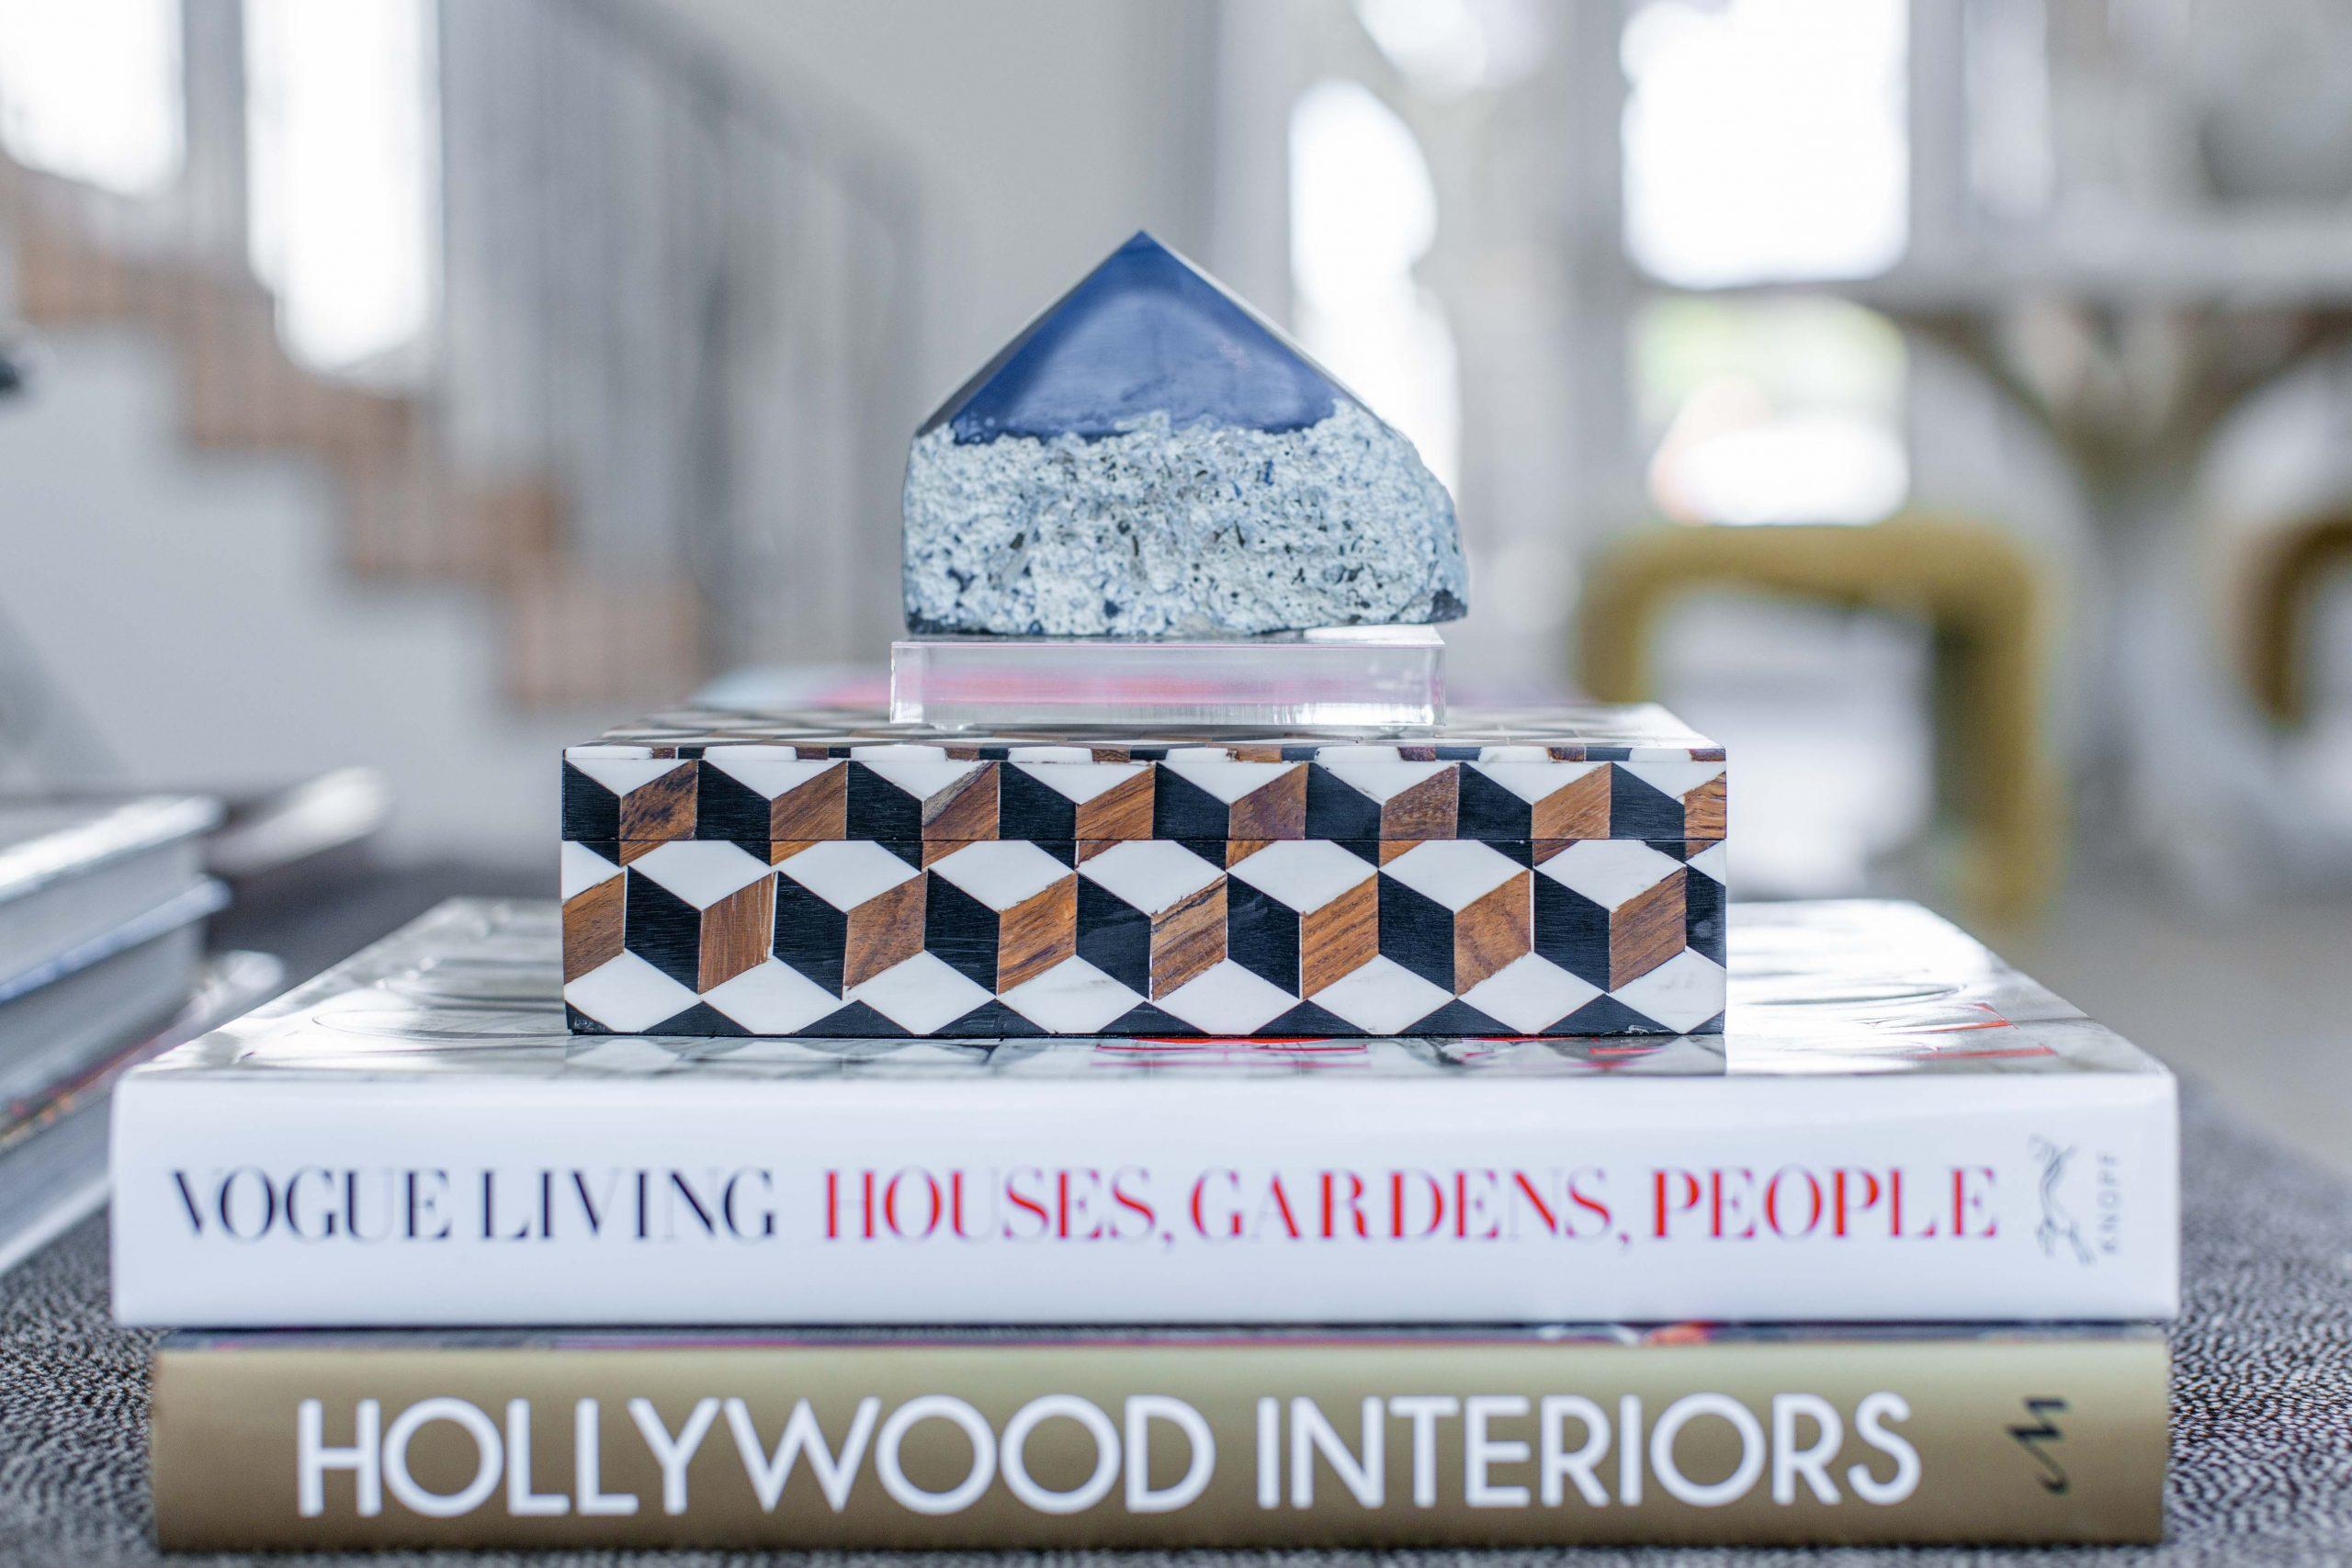 dixon-smith-interiors-baton-rouge-interior-design-custom-ivy-house-show-home-Web-0020